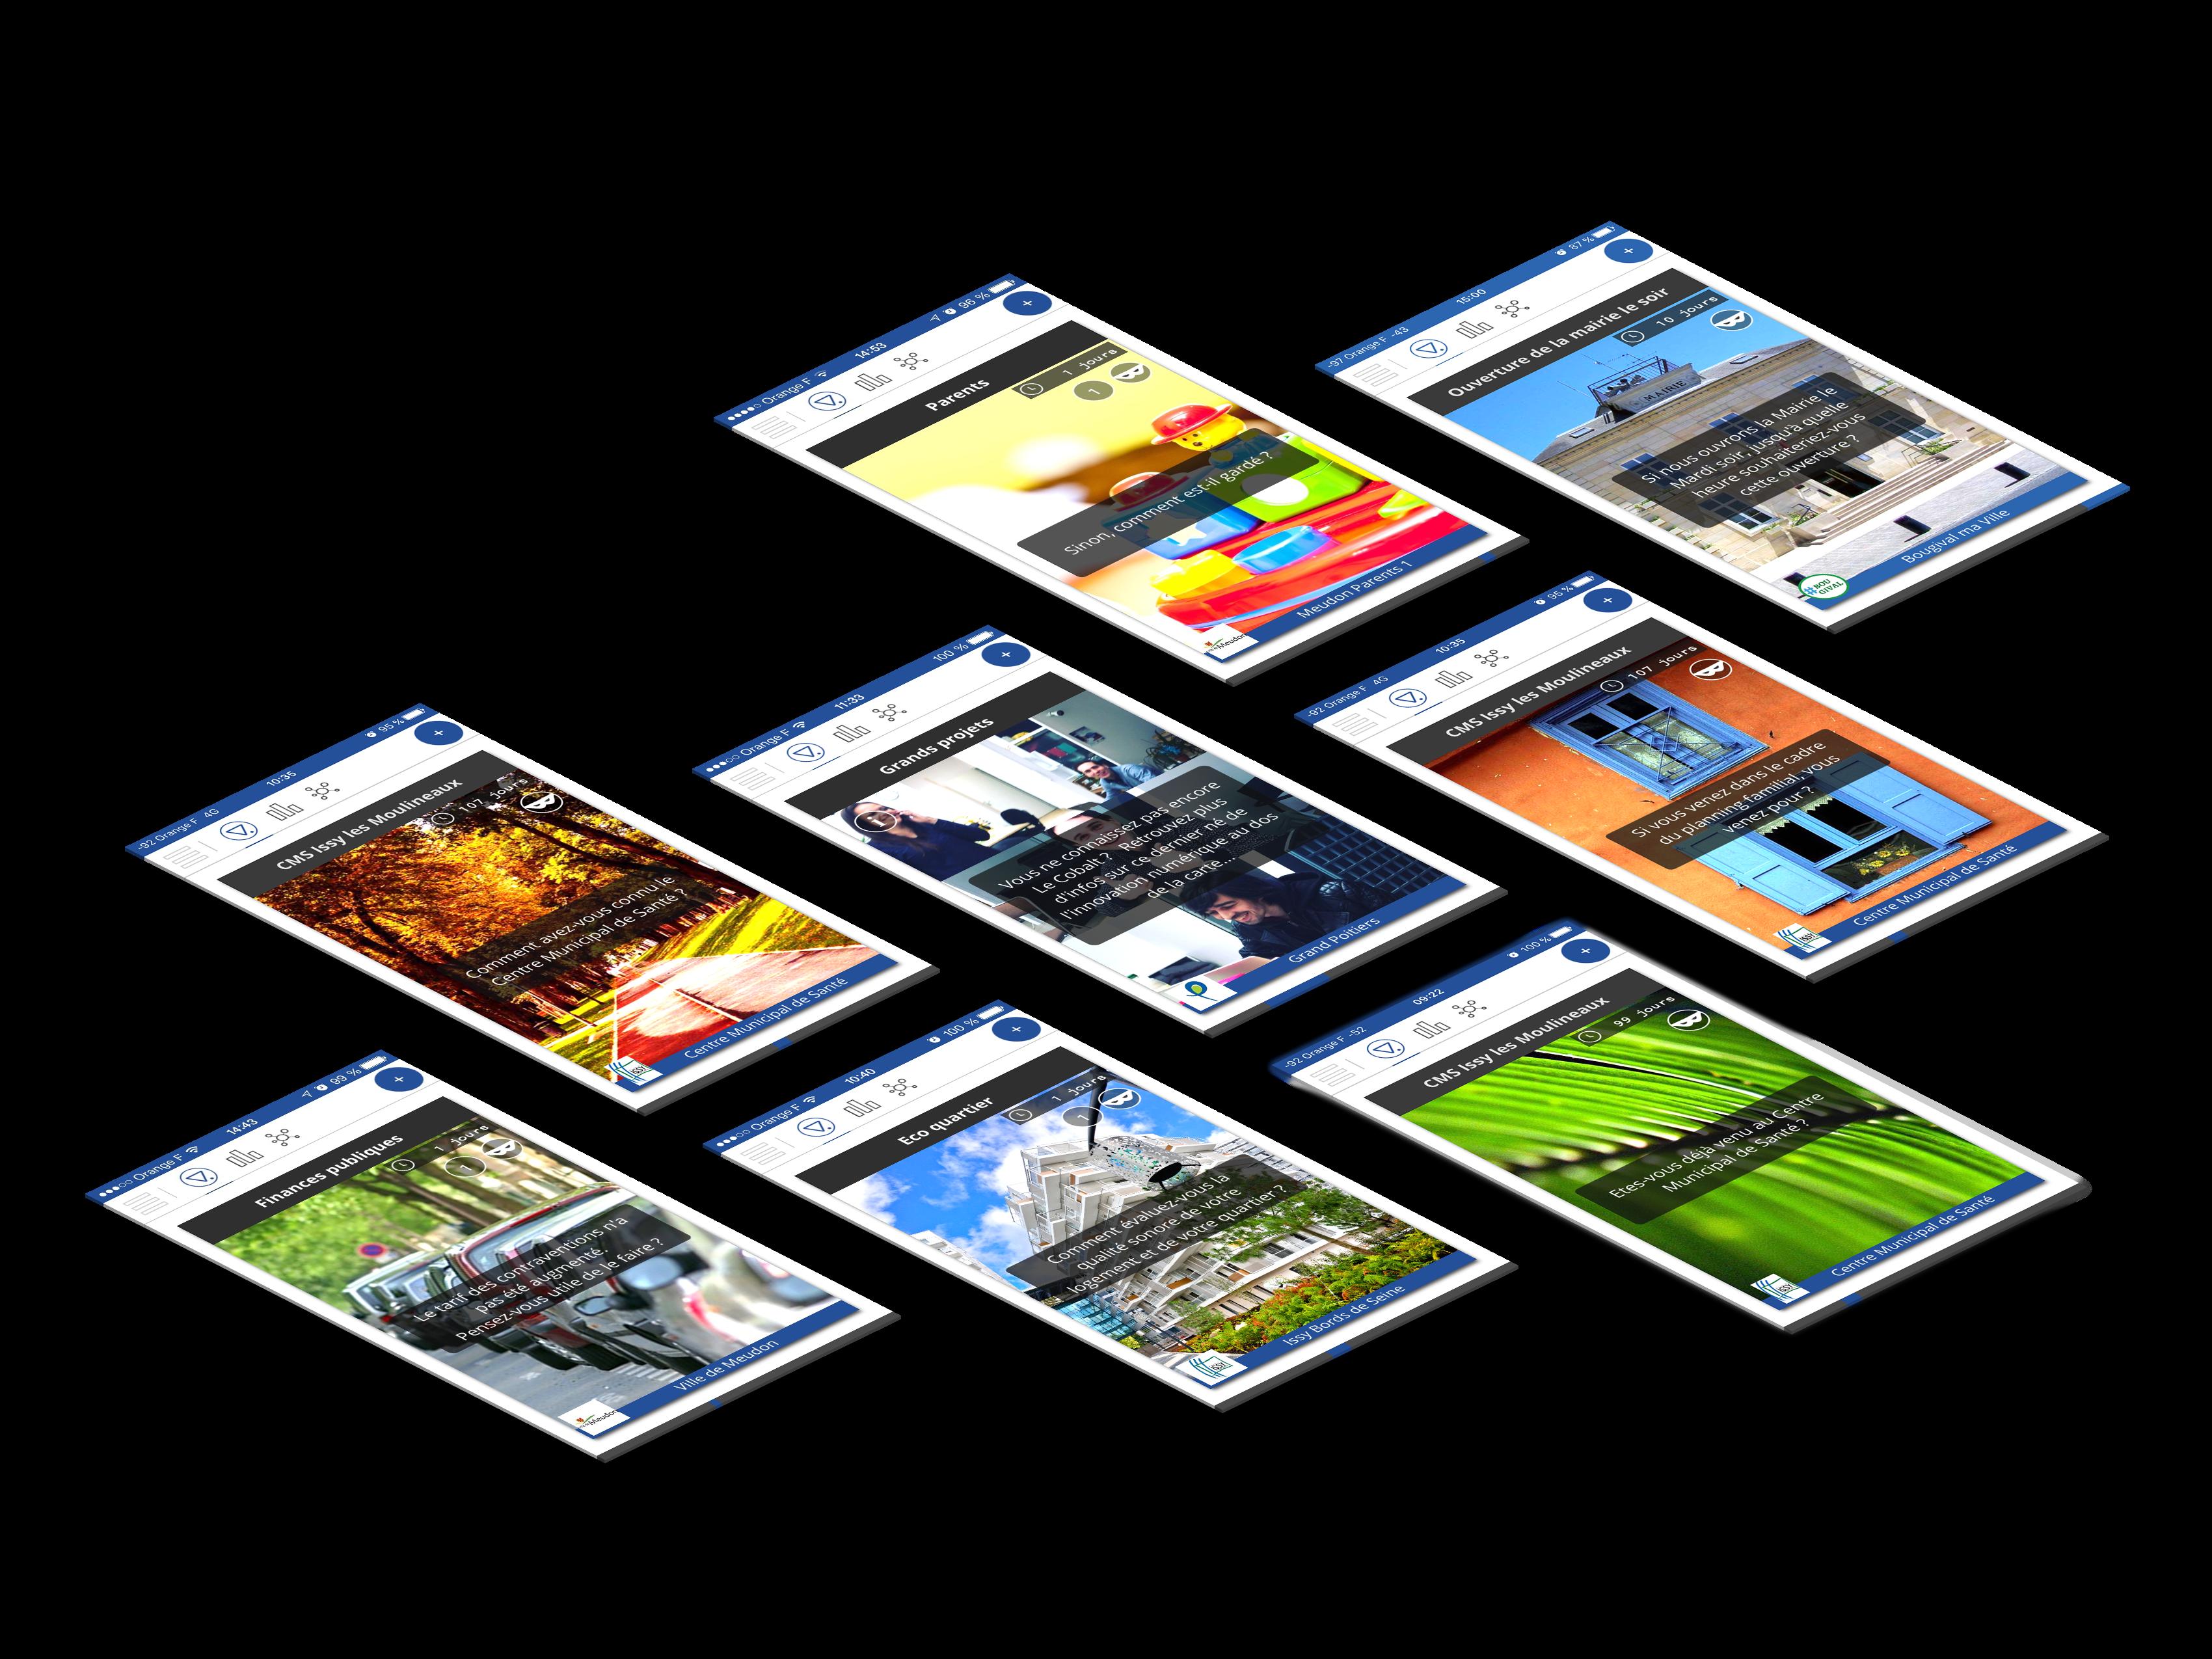 visuel application mobile et plateforme consultation citoyenne Vooter